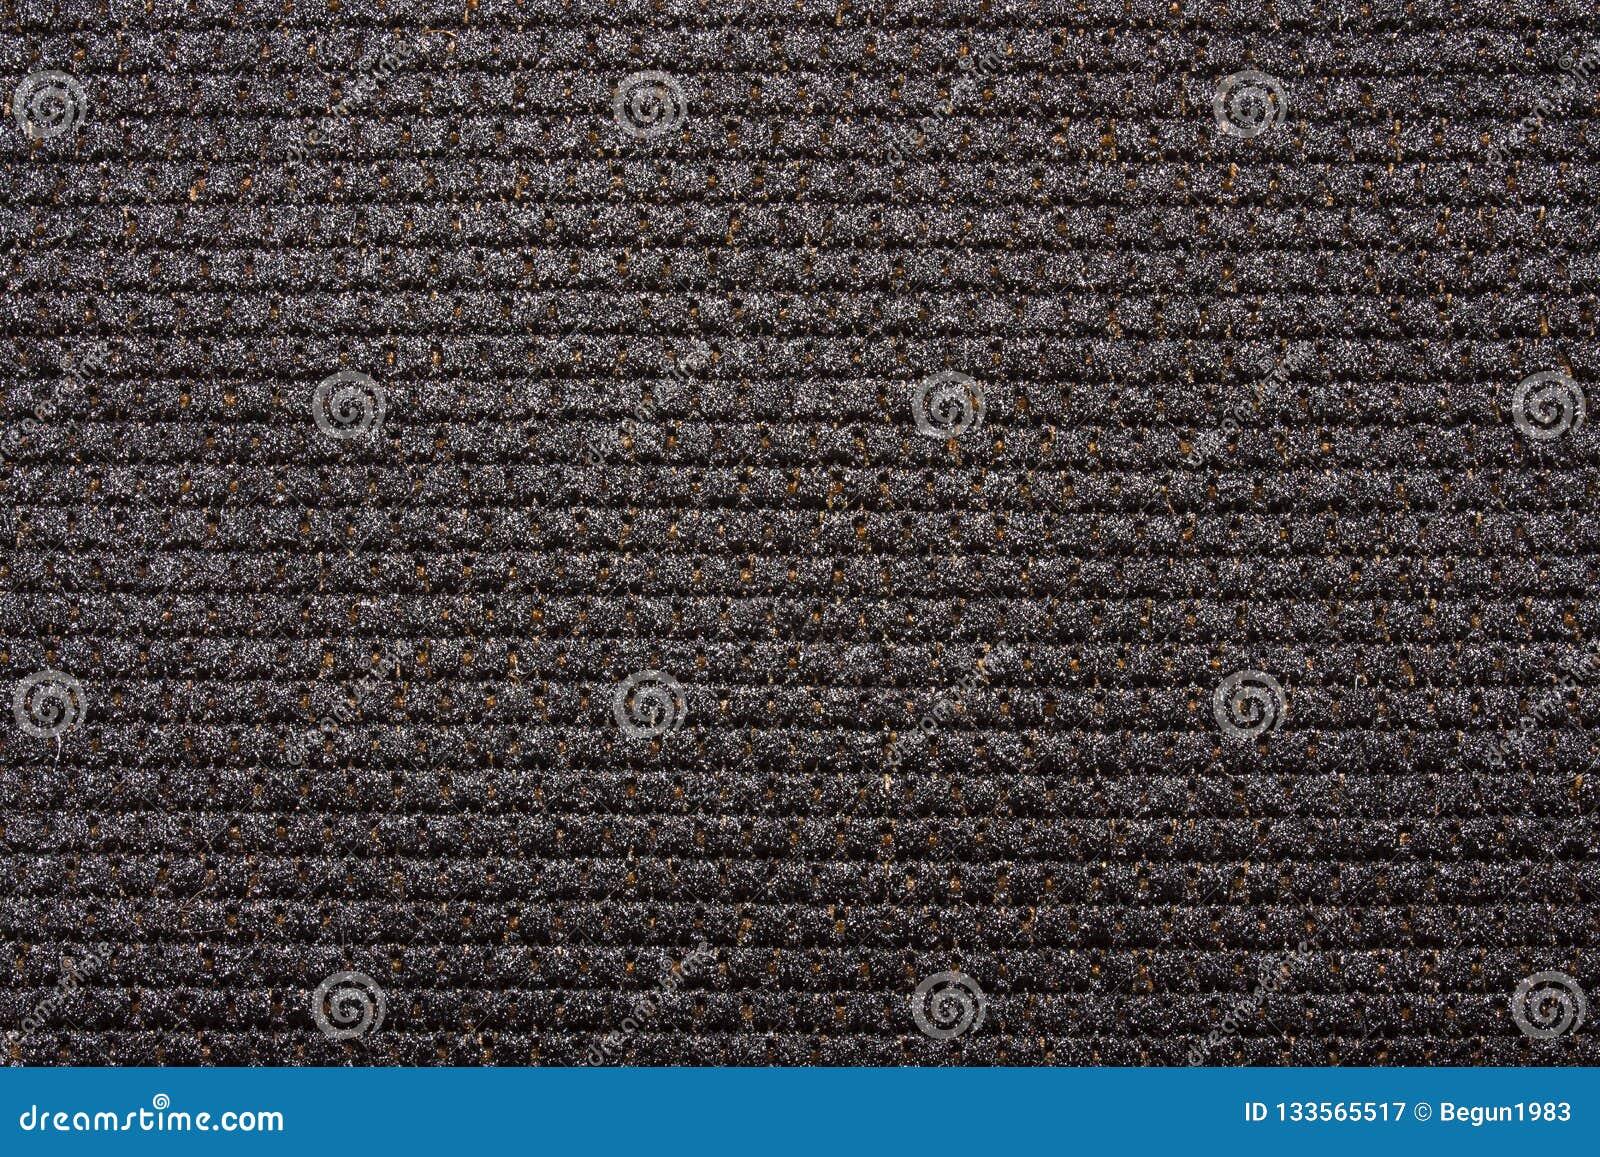 Dense black braided fabric texture.